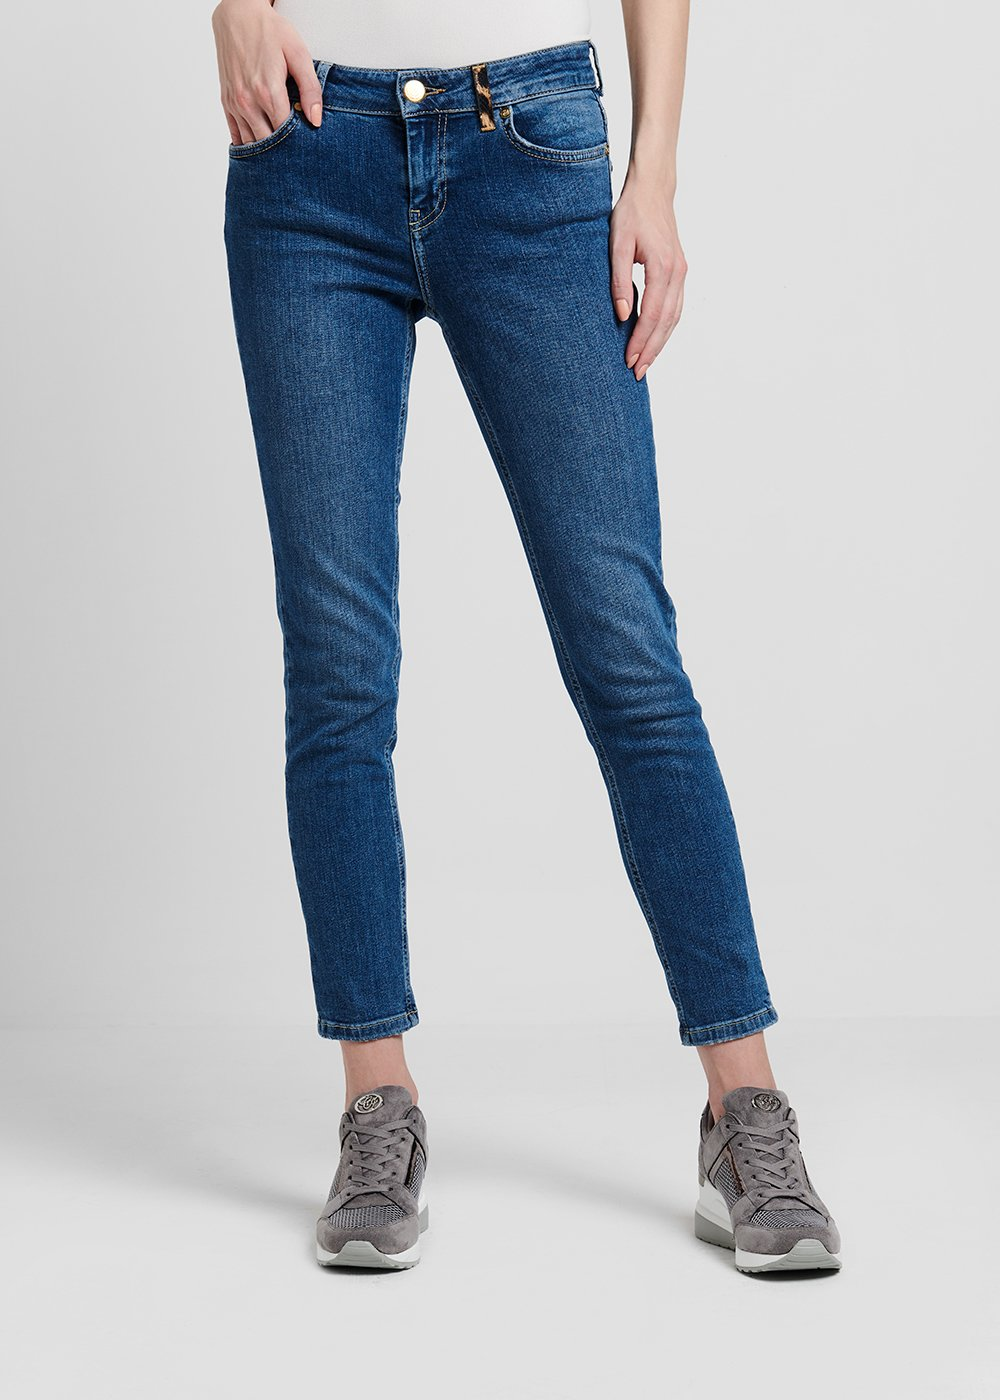 5-pocket skinny medium blue denim